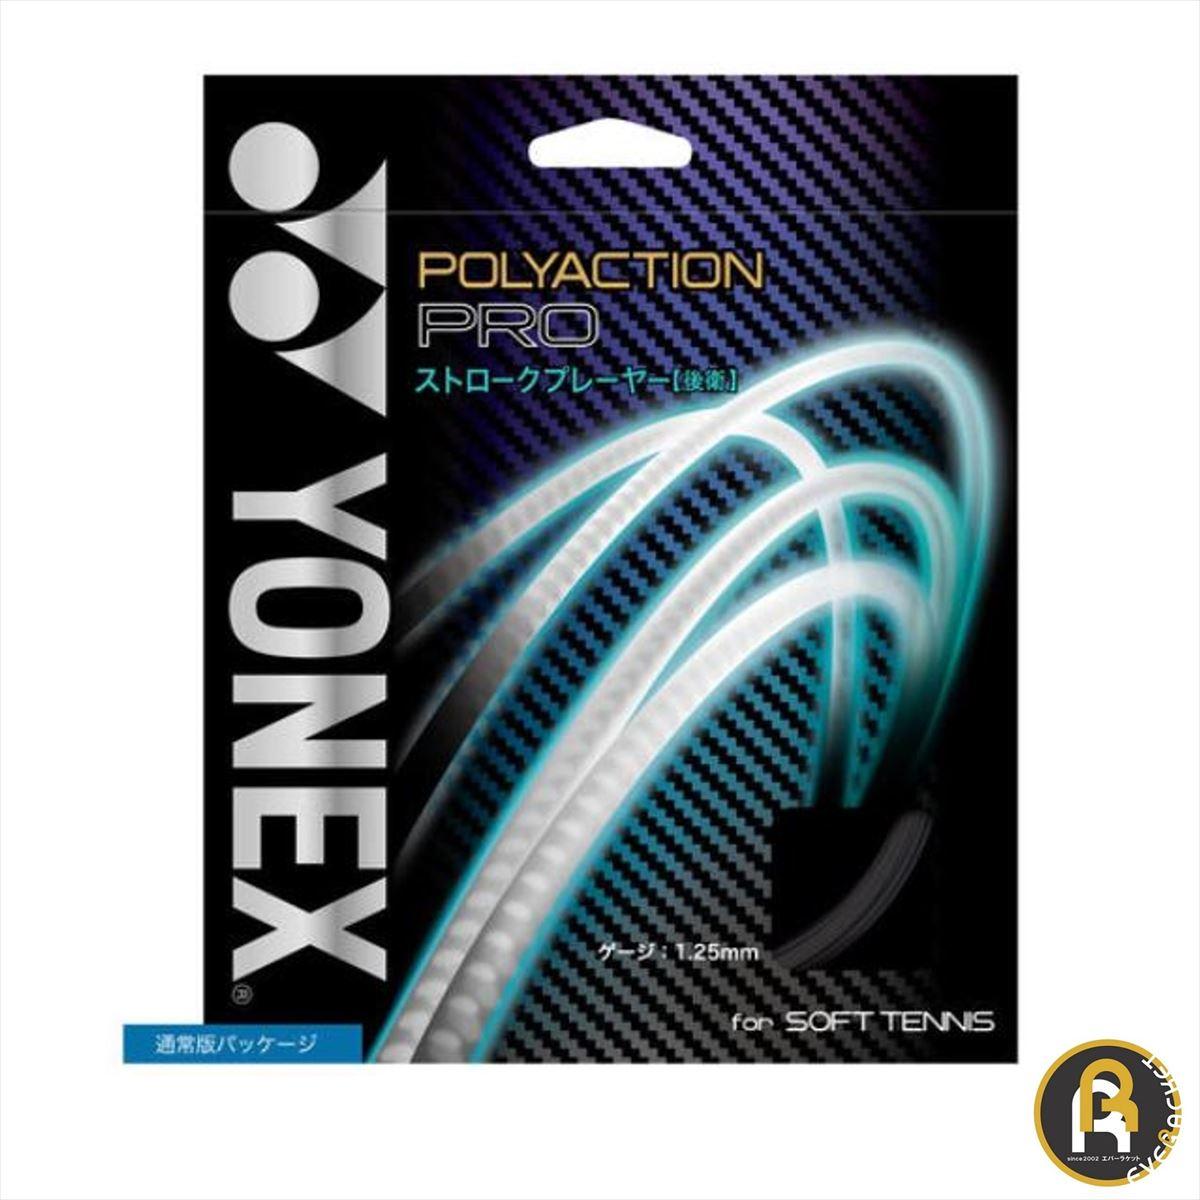 YONEX:ソフトテニスガット 在庫限り 新商品!新型 最短出荷 ポスト投函送料無料 YONEX ヨネックス ソフトテニスストリング ガット ソフトテニス ポリアクションプロ SGPP